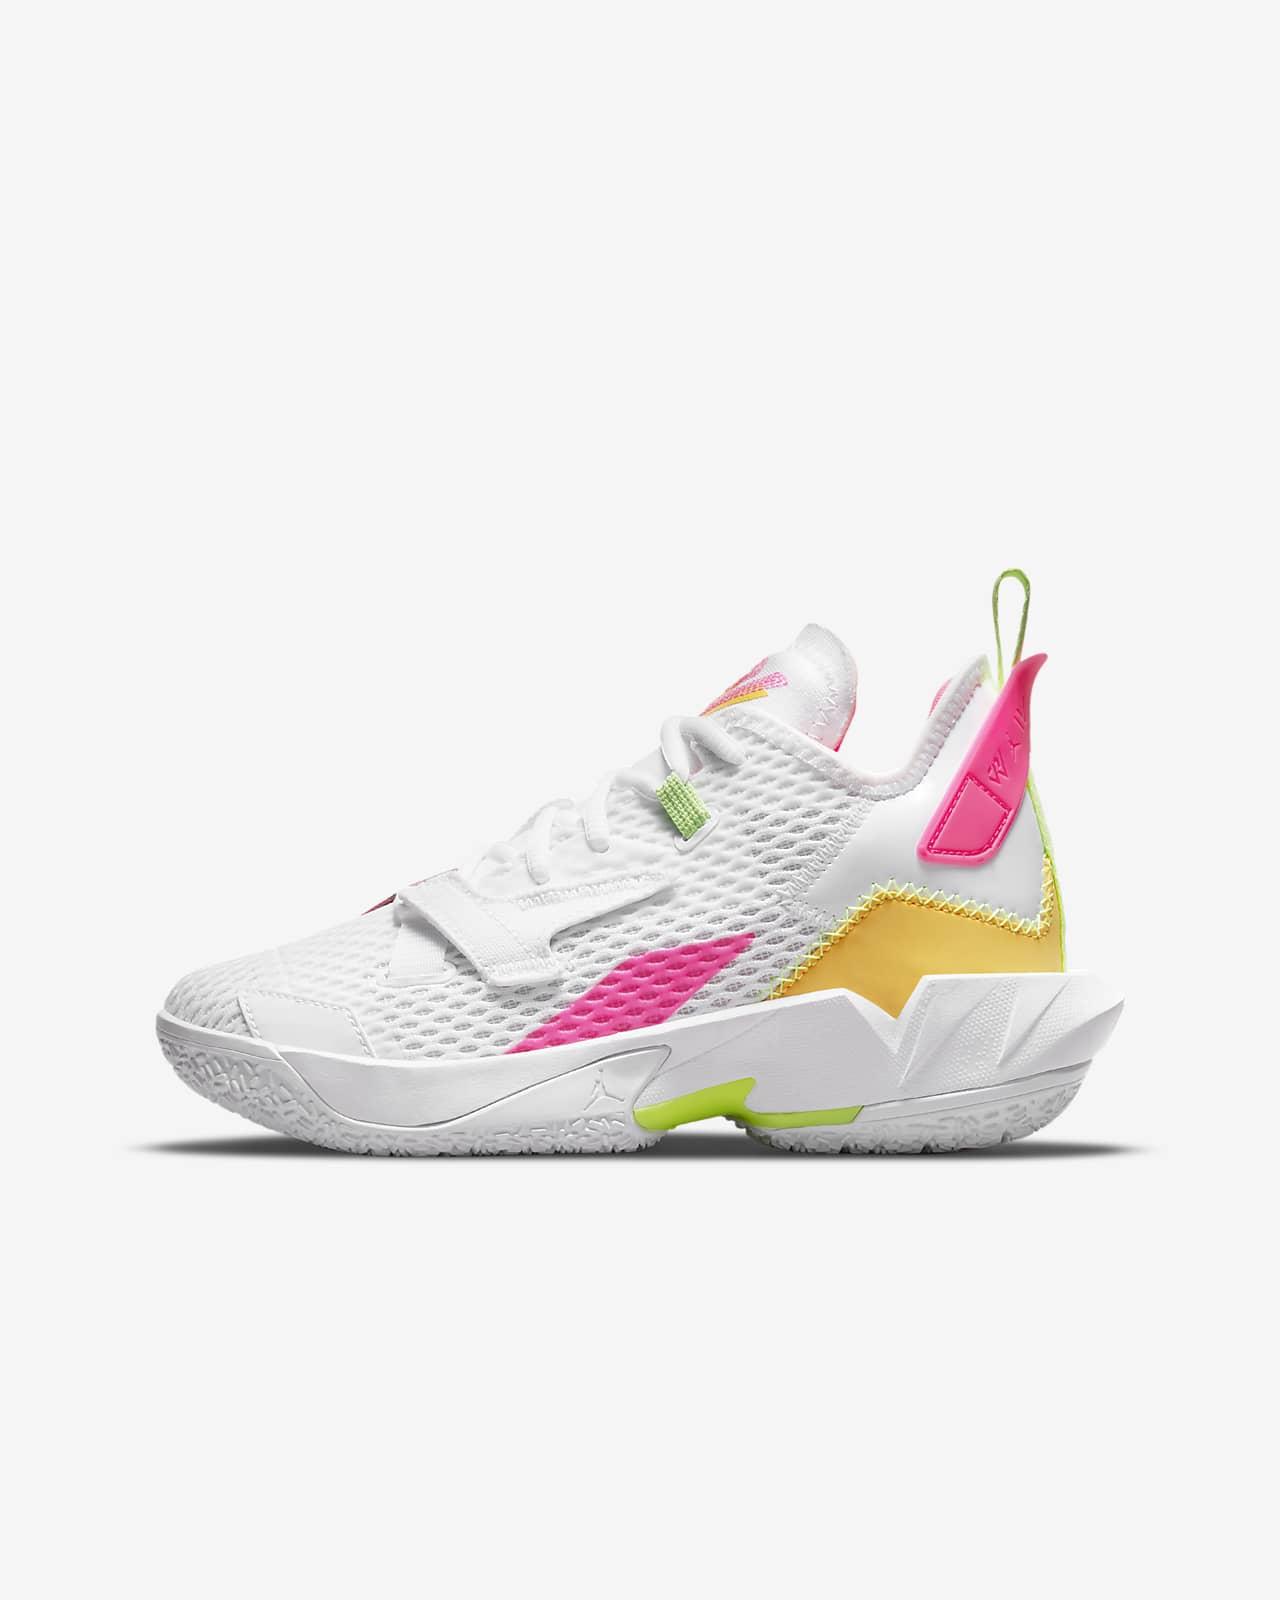 Jordan 'Why Not?'Zer0.4 Older Kids' Basketball Shoes